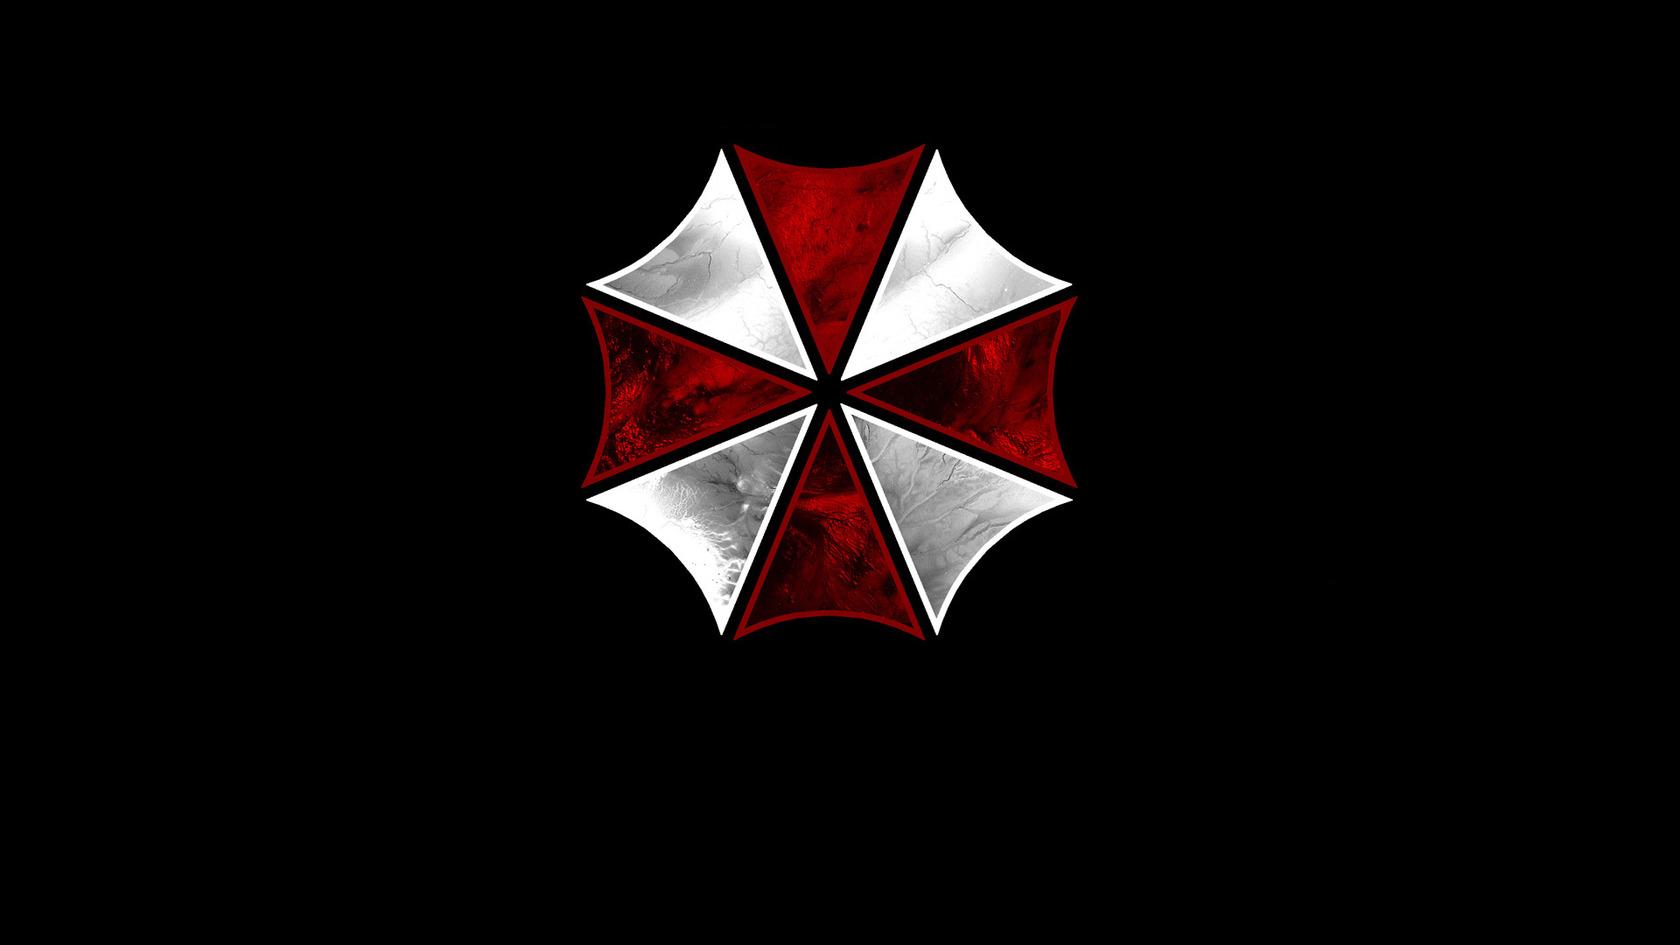 Picture-OF-Resident-Evil-Desktop-WallPaper-HD-http-imashon-com-w-game-picture-of-resident-evil-d-wallpaper-wp4809536